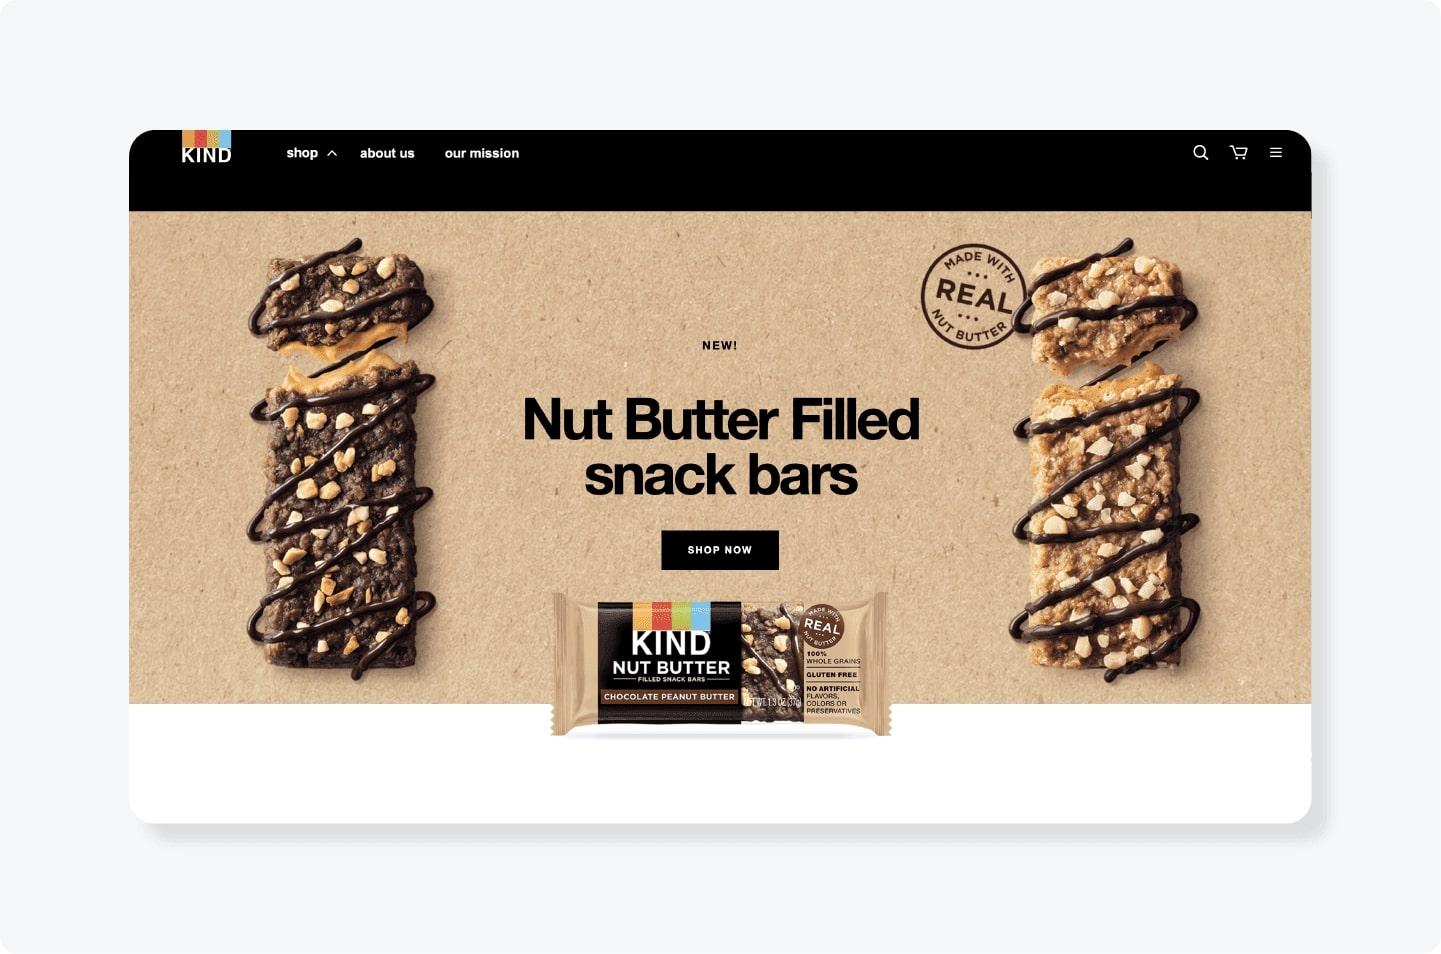 Kind Nut butter bars advertisement